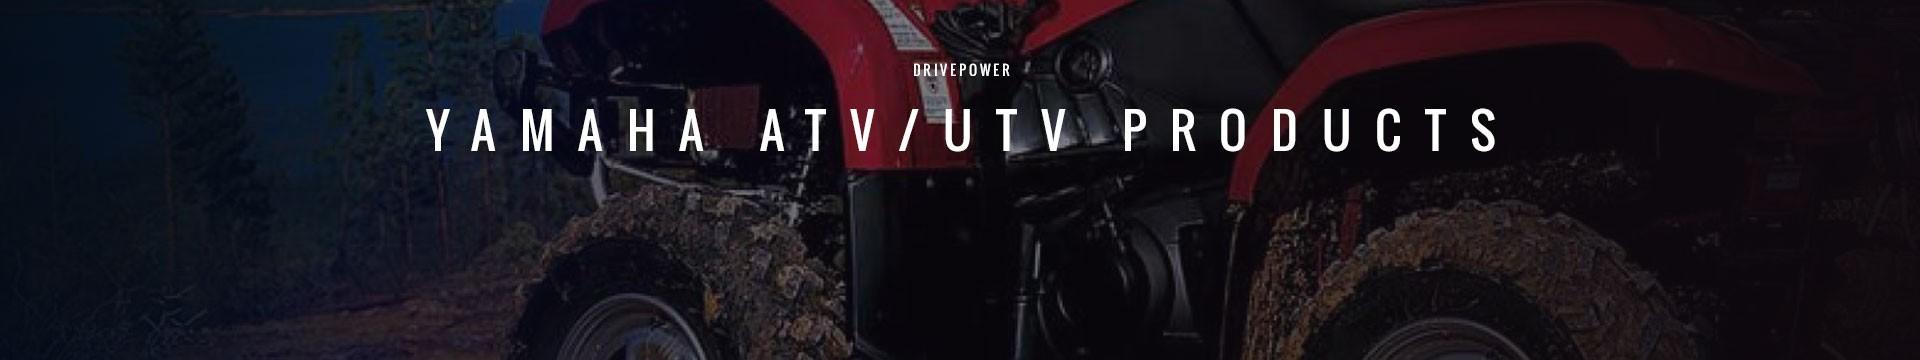 Yamaha ATV Products